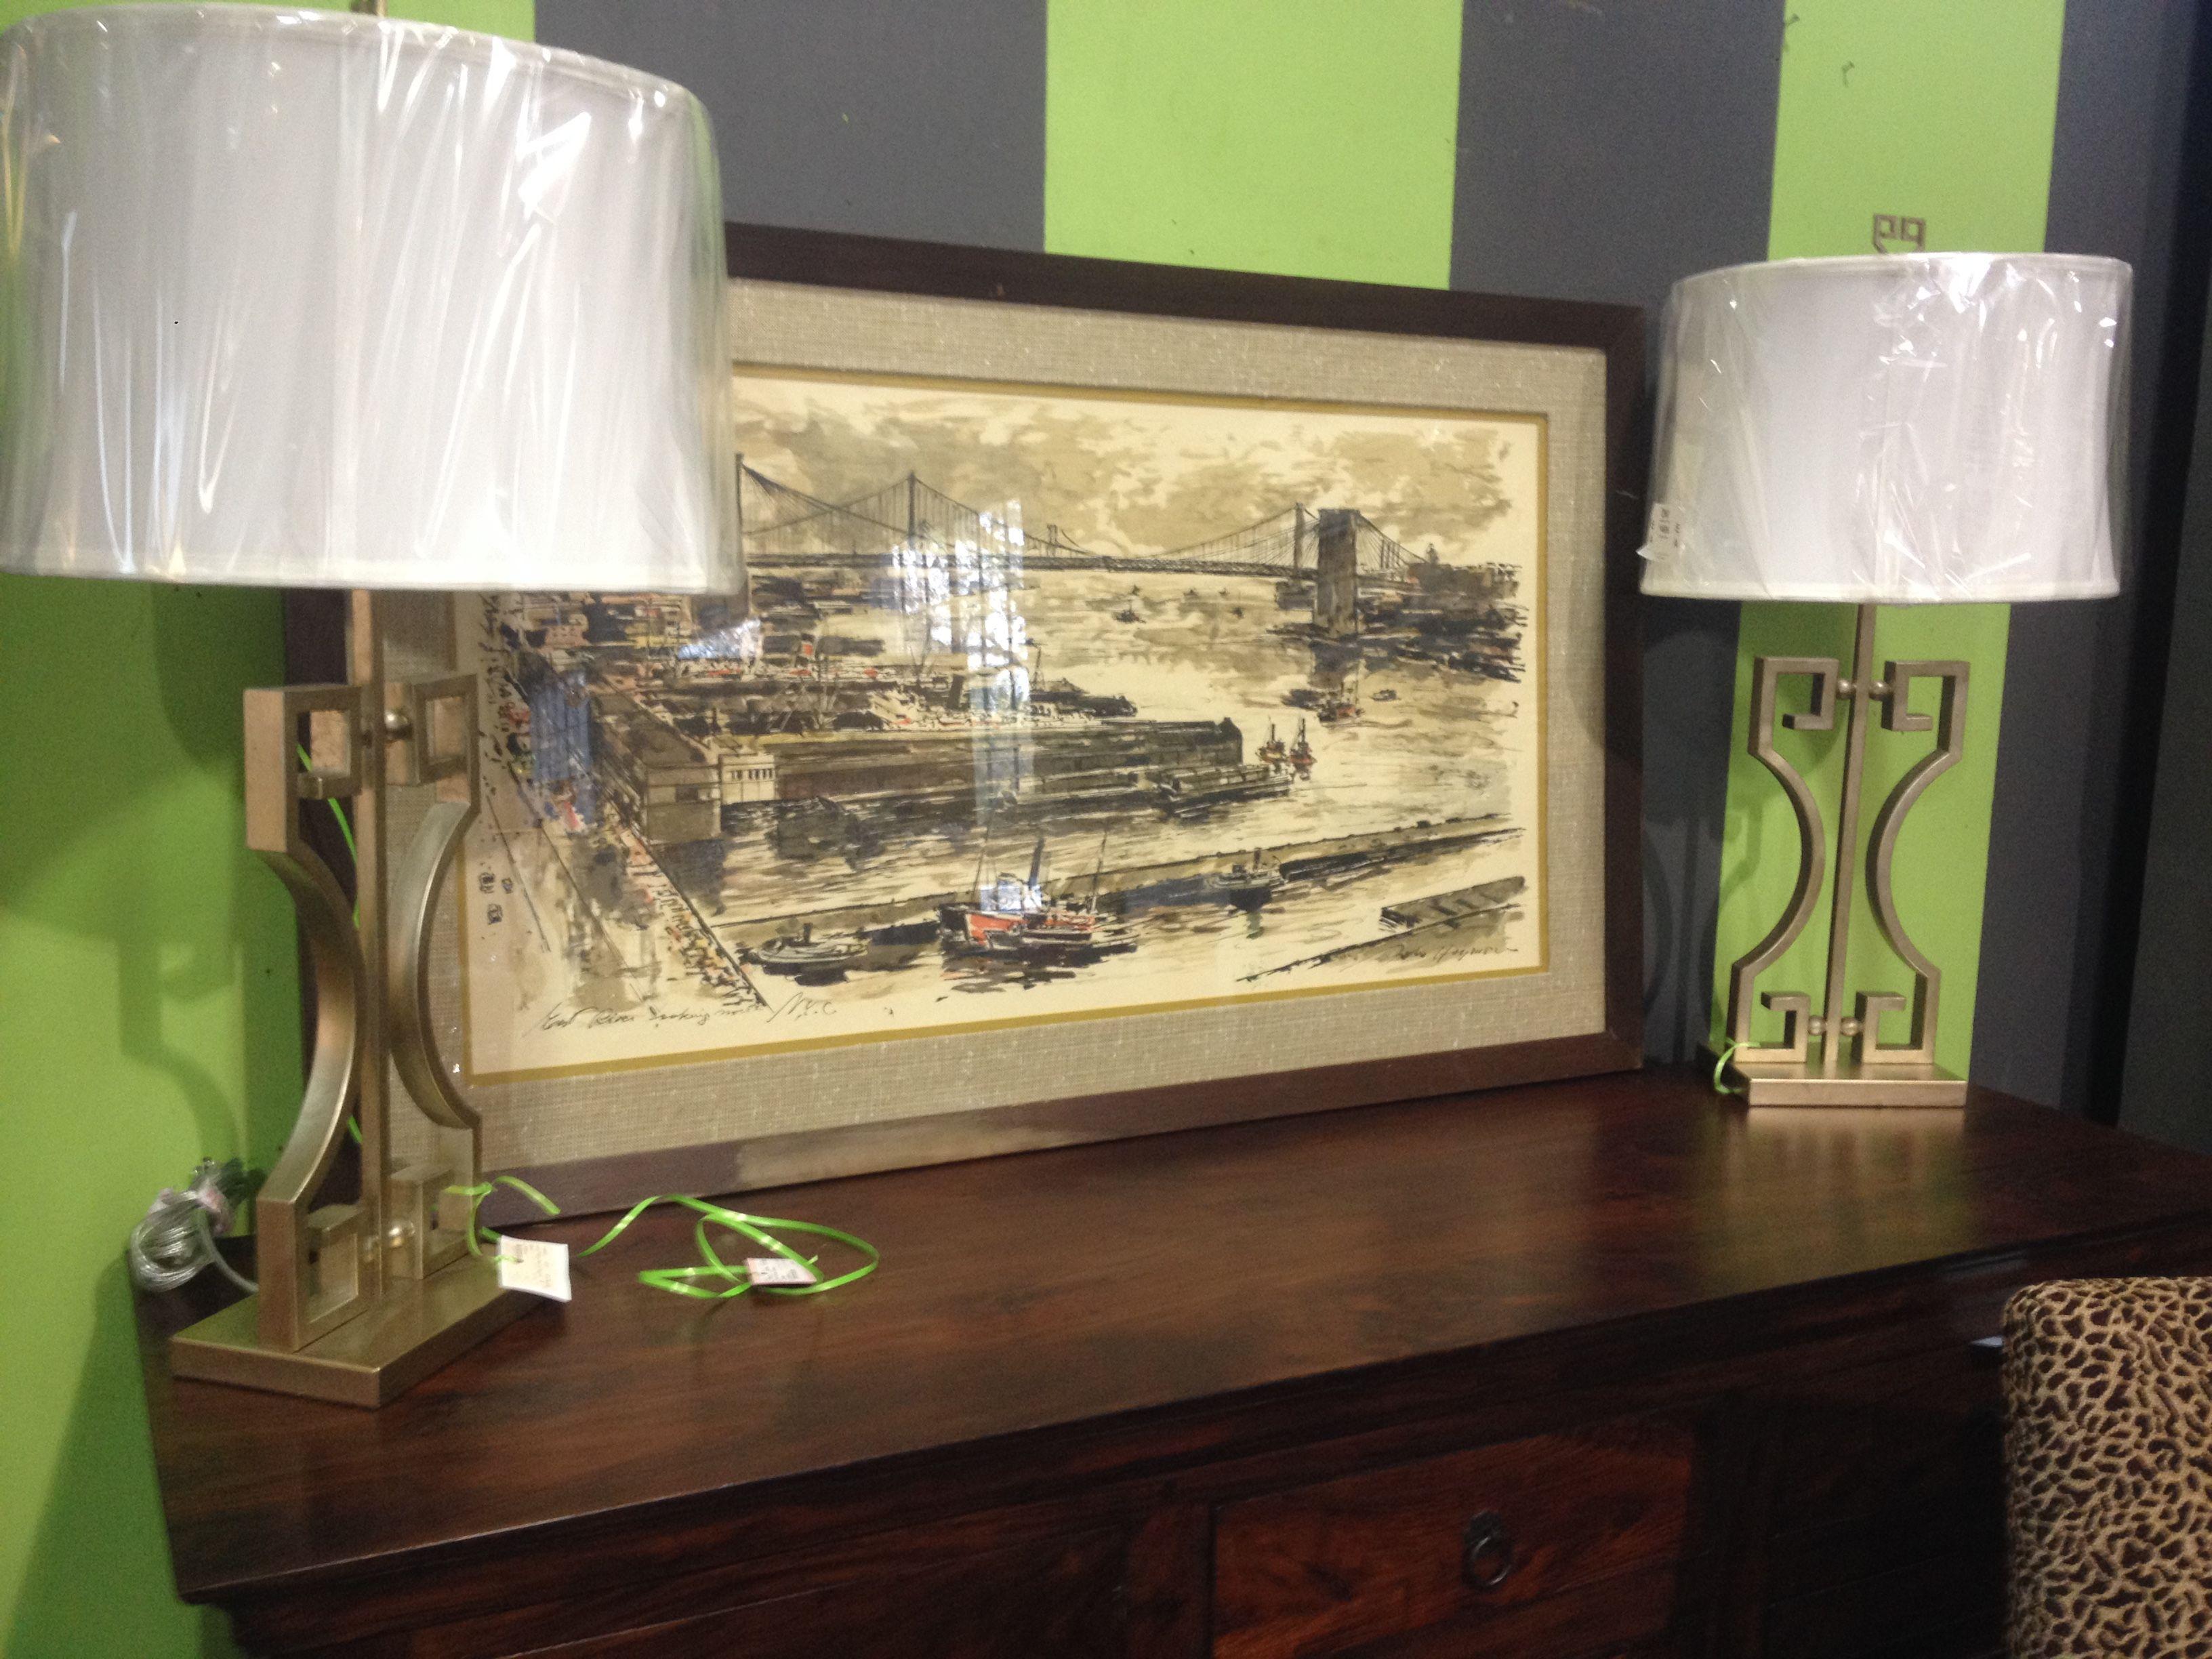 New lamps consignment furniture decor home decor